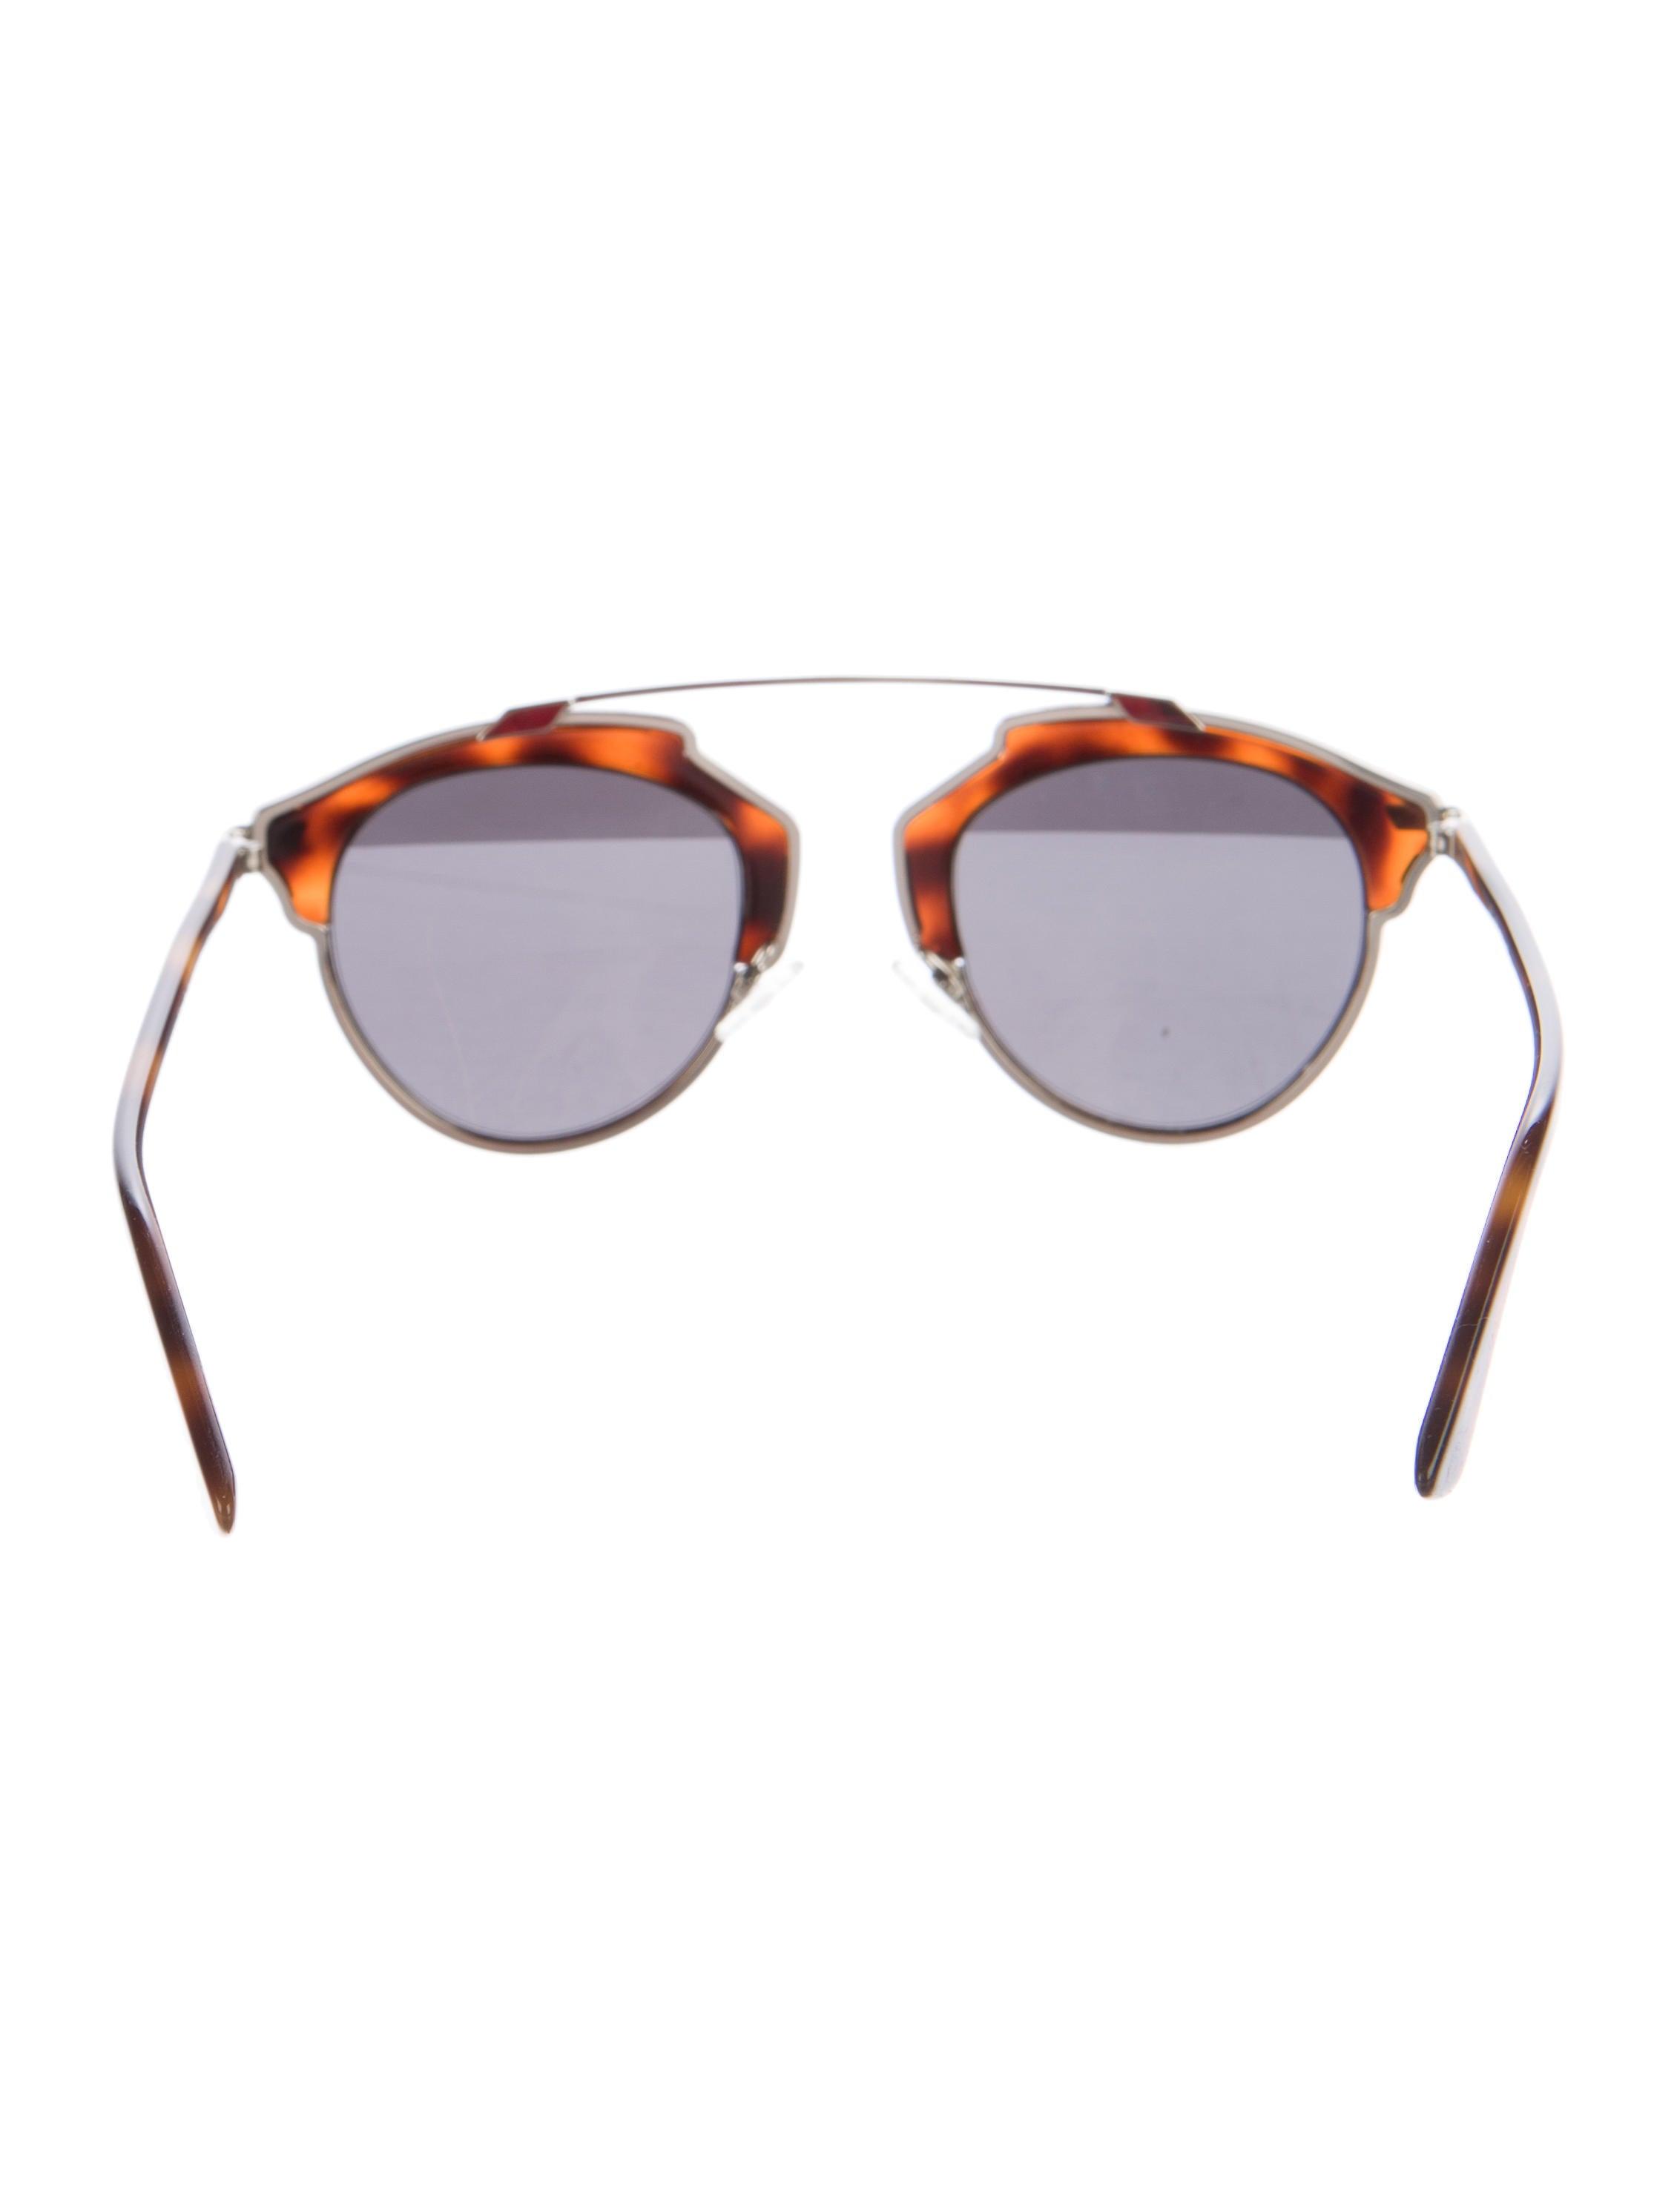 4dd5dce2c609 Dior Sunglasses 2017 Mens - Bitterroot Public Library